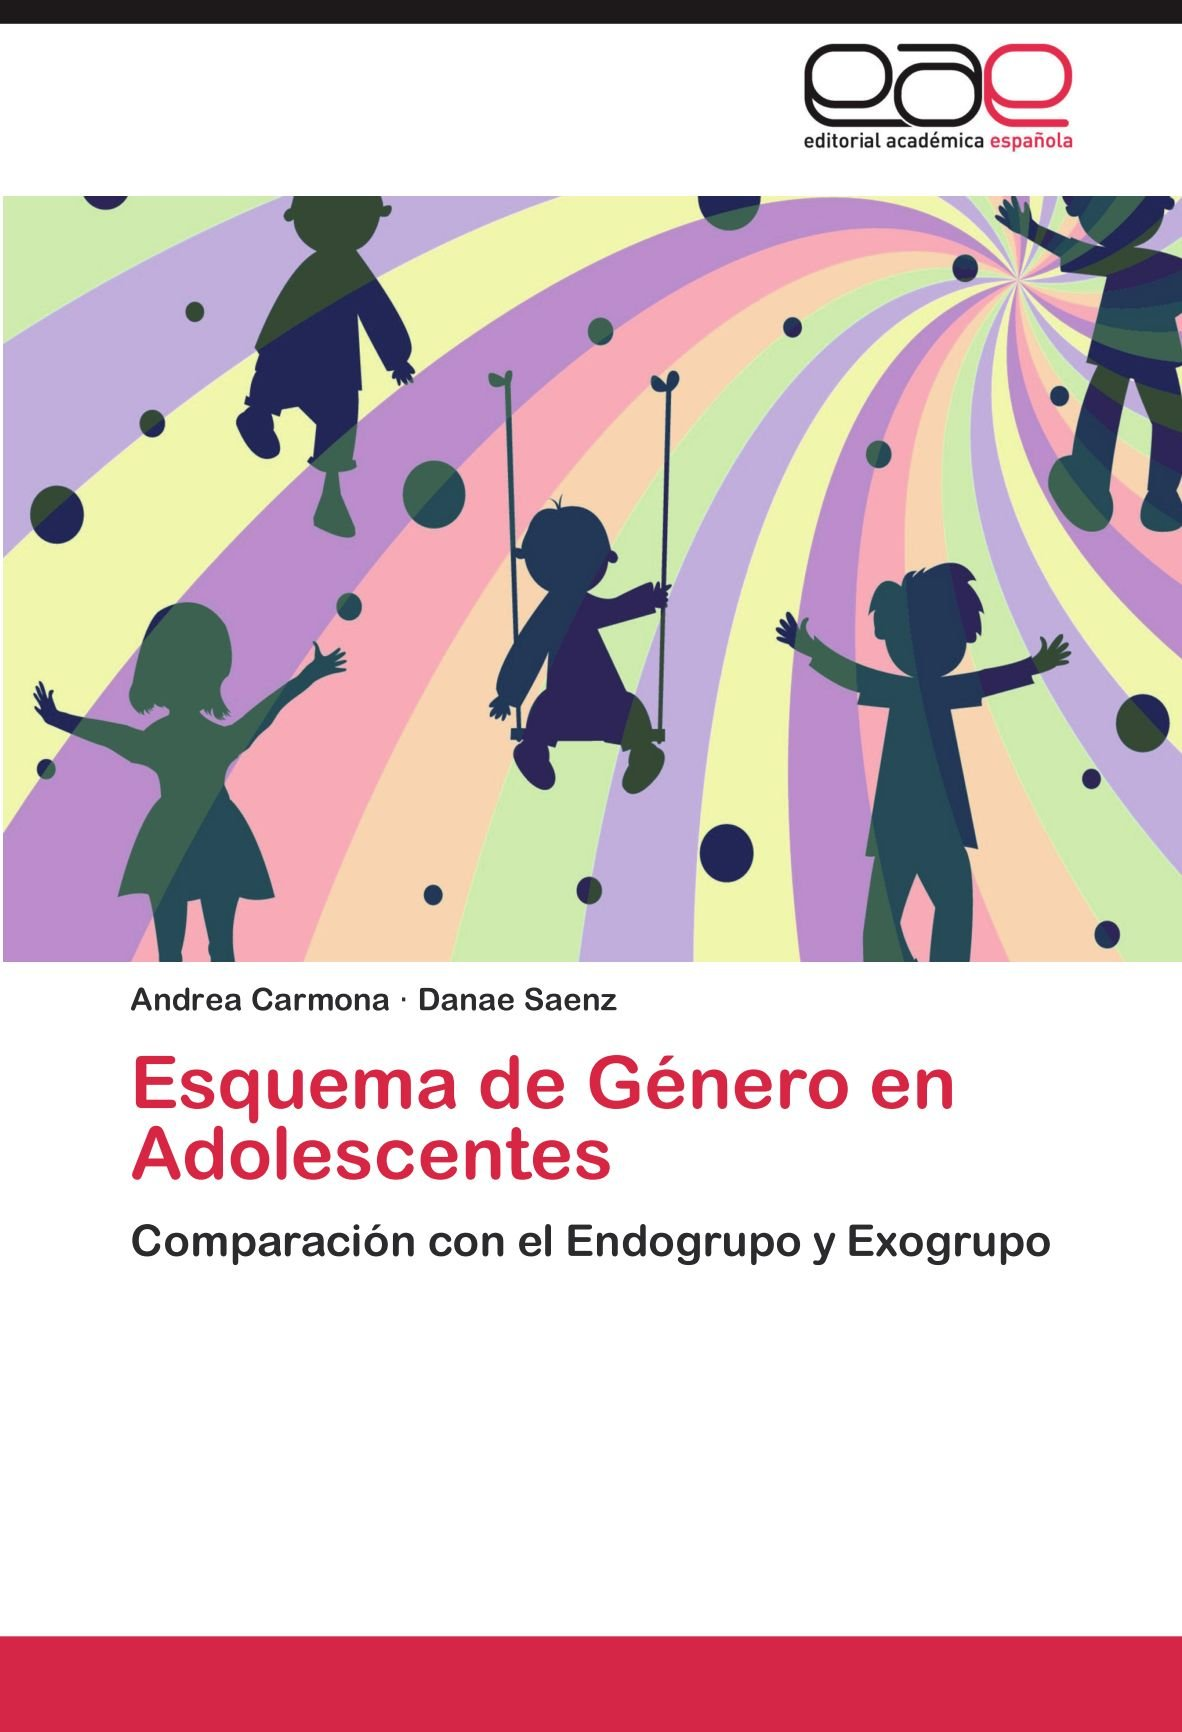 Esquema de Género en Adolescentes: Comparación con el Endogrupo y Exogrupo (Spanish Edition): Andrea Carmona, Danae Saenz: 9783847358190: Amazon.com: Books